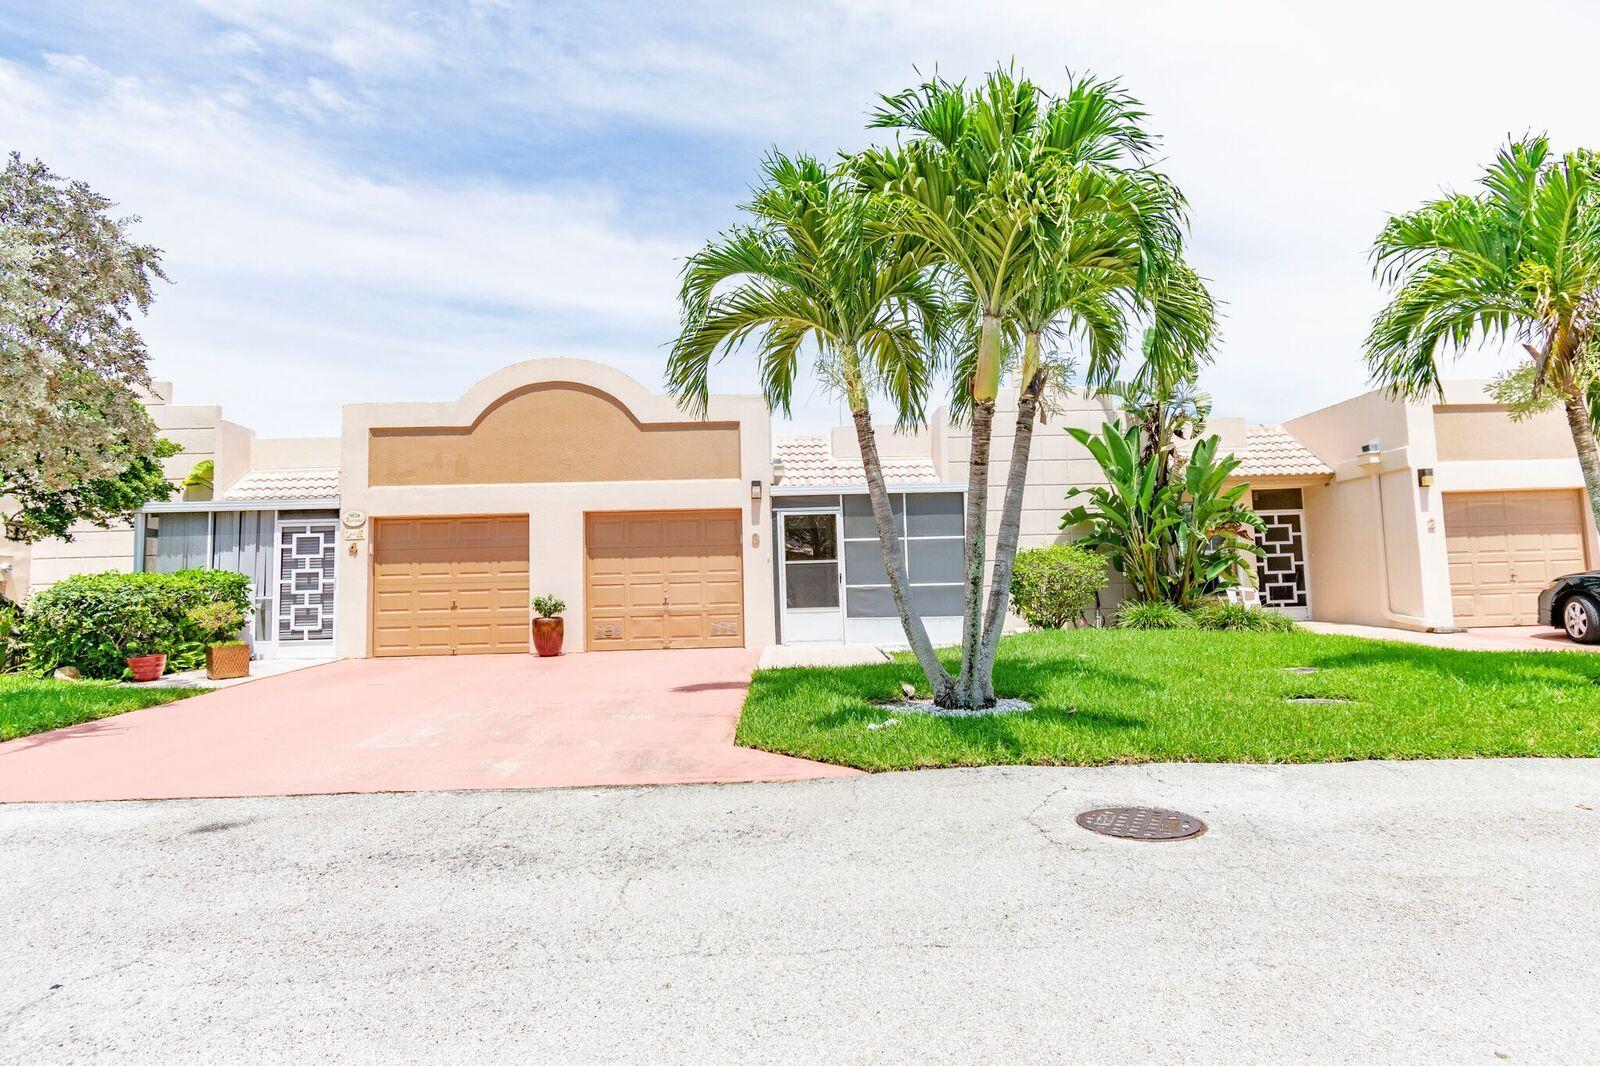 Home for sale in Town Villas Boca Raton Florida